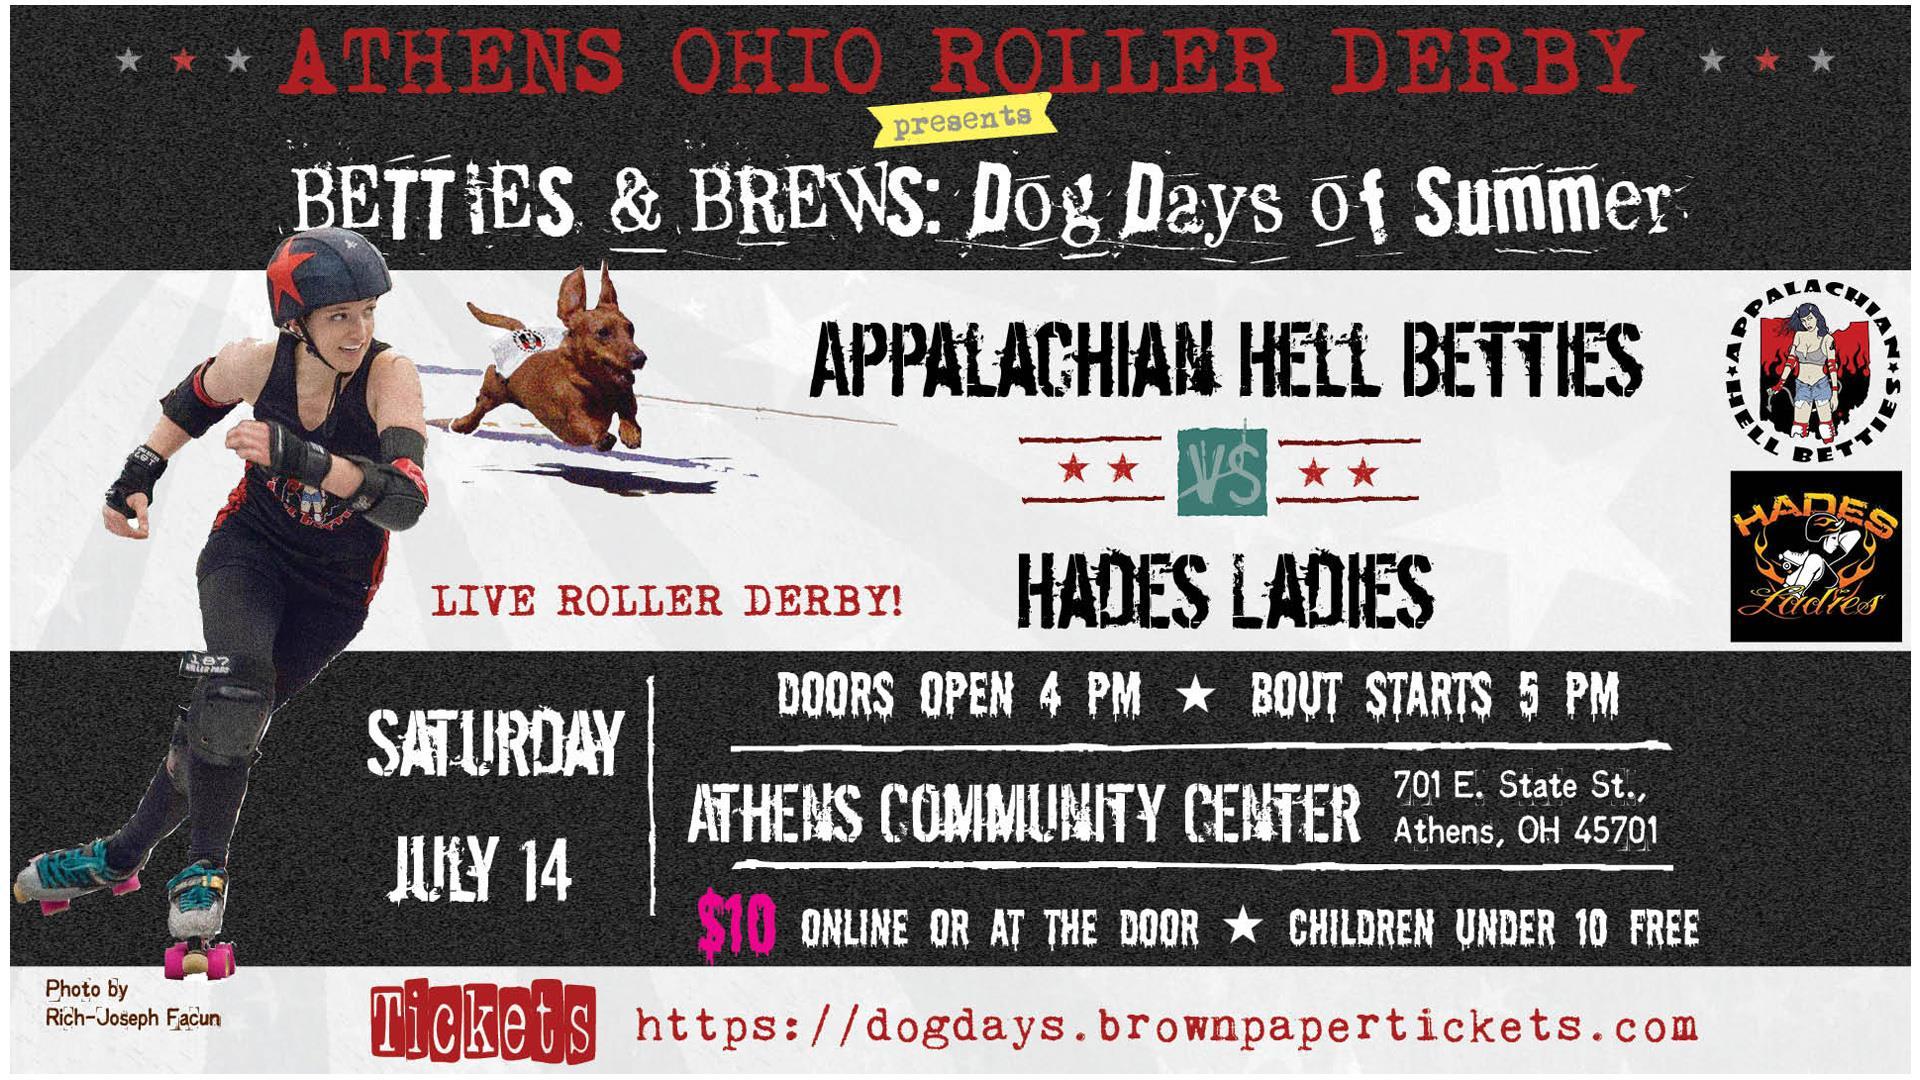 Betties & Brews: Dog Days of Summer